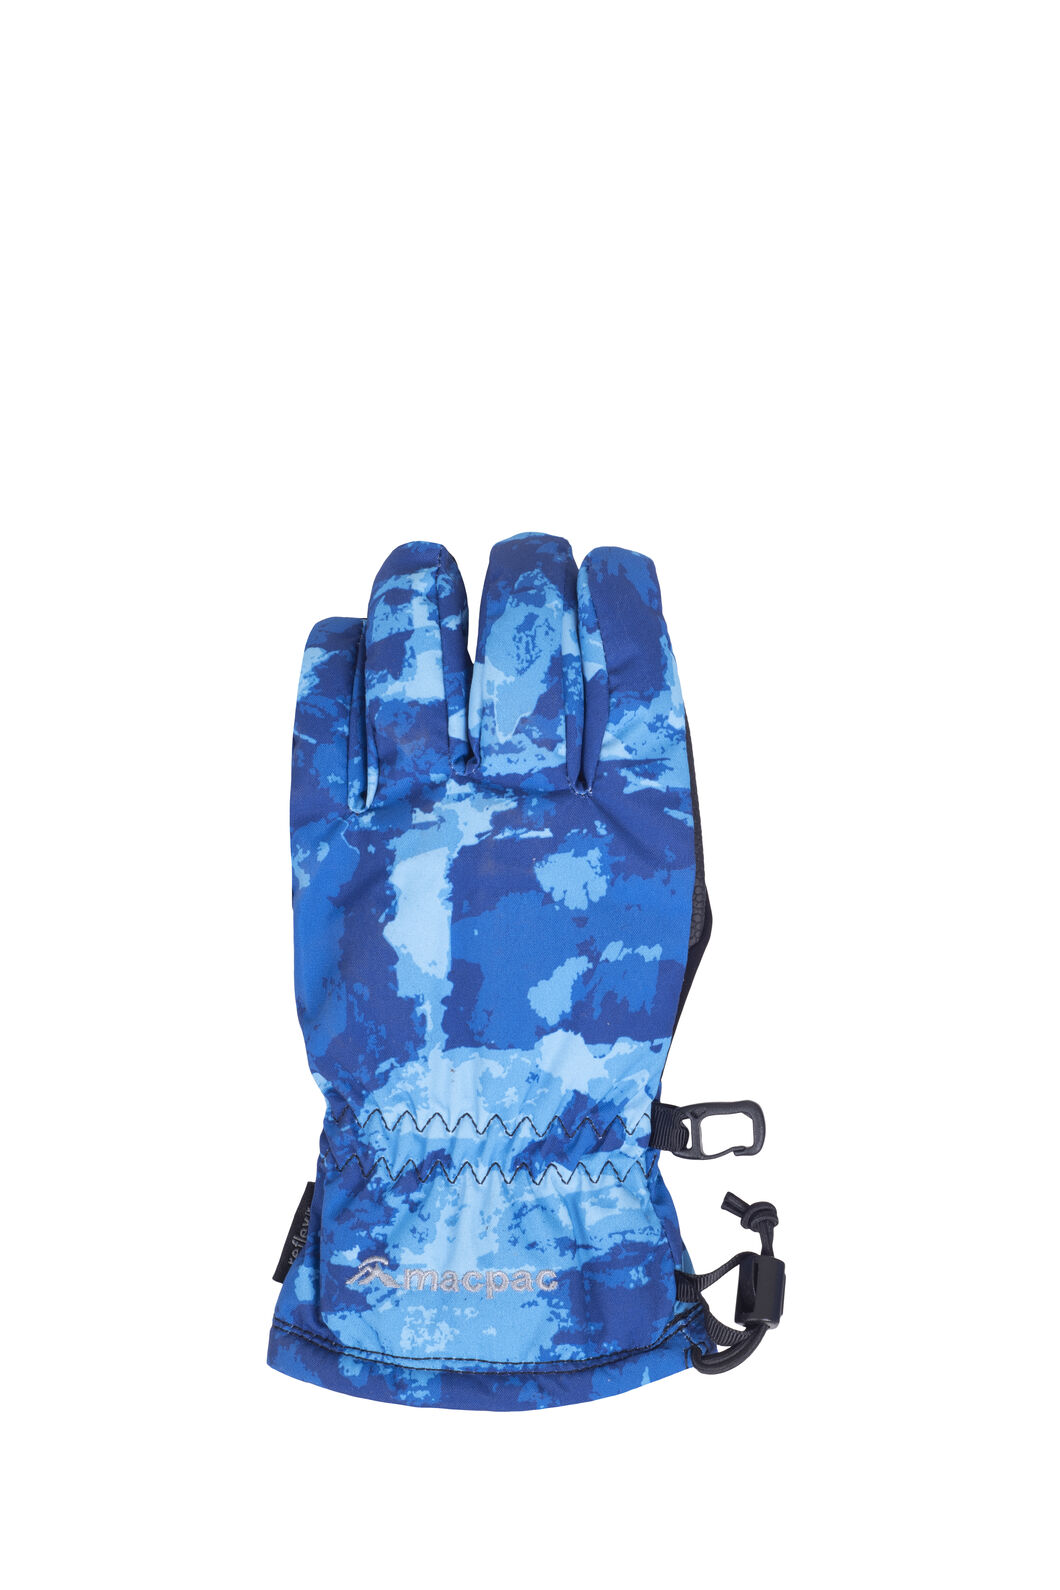 Macpac Spree Ski Gloves, Blue Print, hi-res